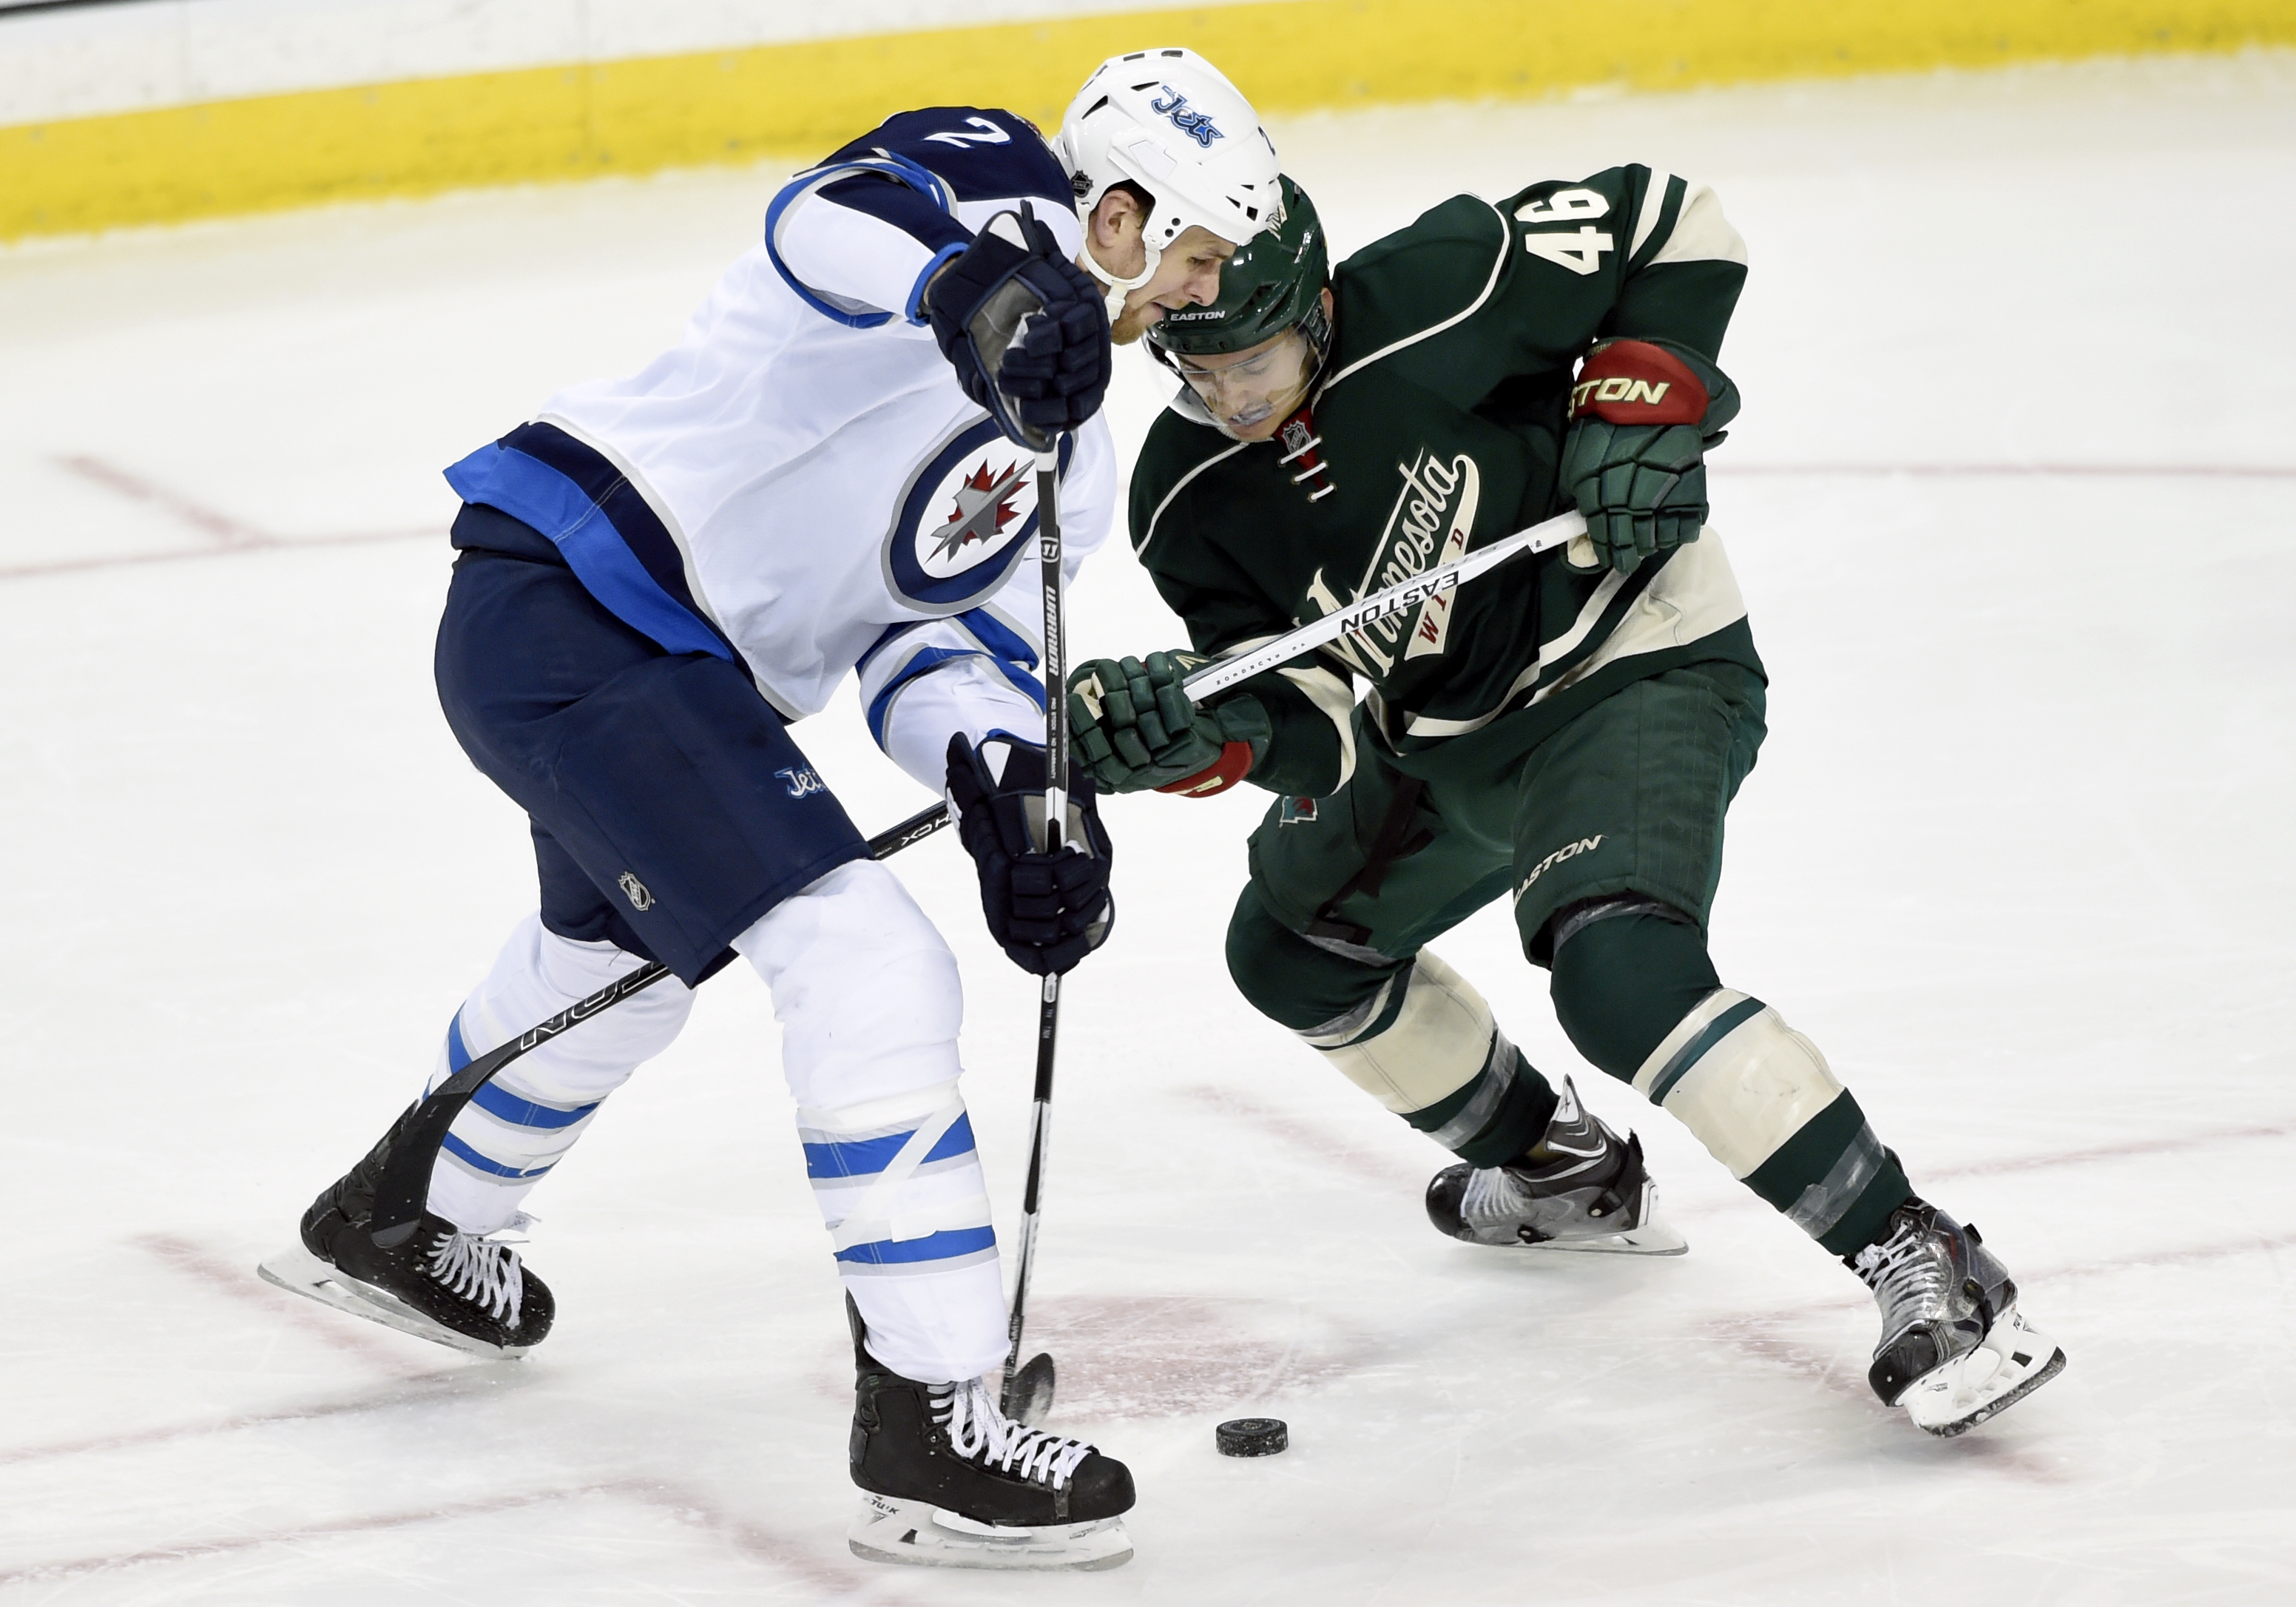 Winnipeg Jets defenseman Adam Pardy (2) keeps the puck away from Minnesota Wild defenseman Jared Spurgeon (46) during the first period of an NHL hockey game Friday, Jan. 15, 2016, in St. Paul, Minn. (AP Photo/Hannah Foslien)